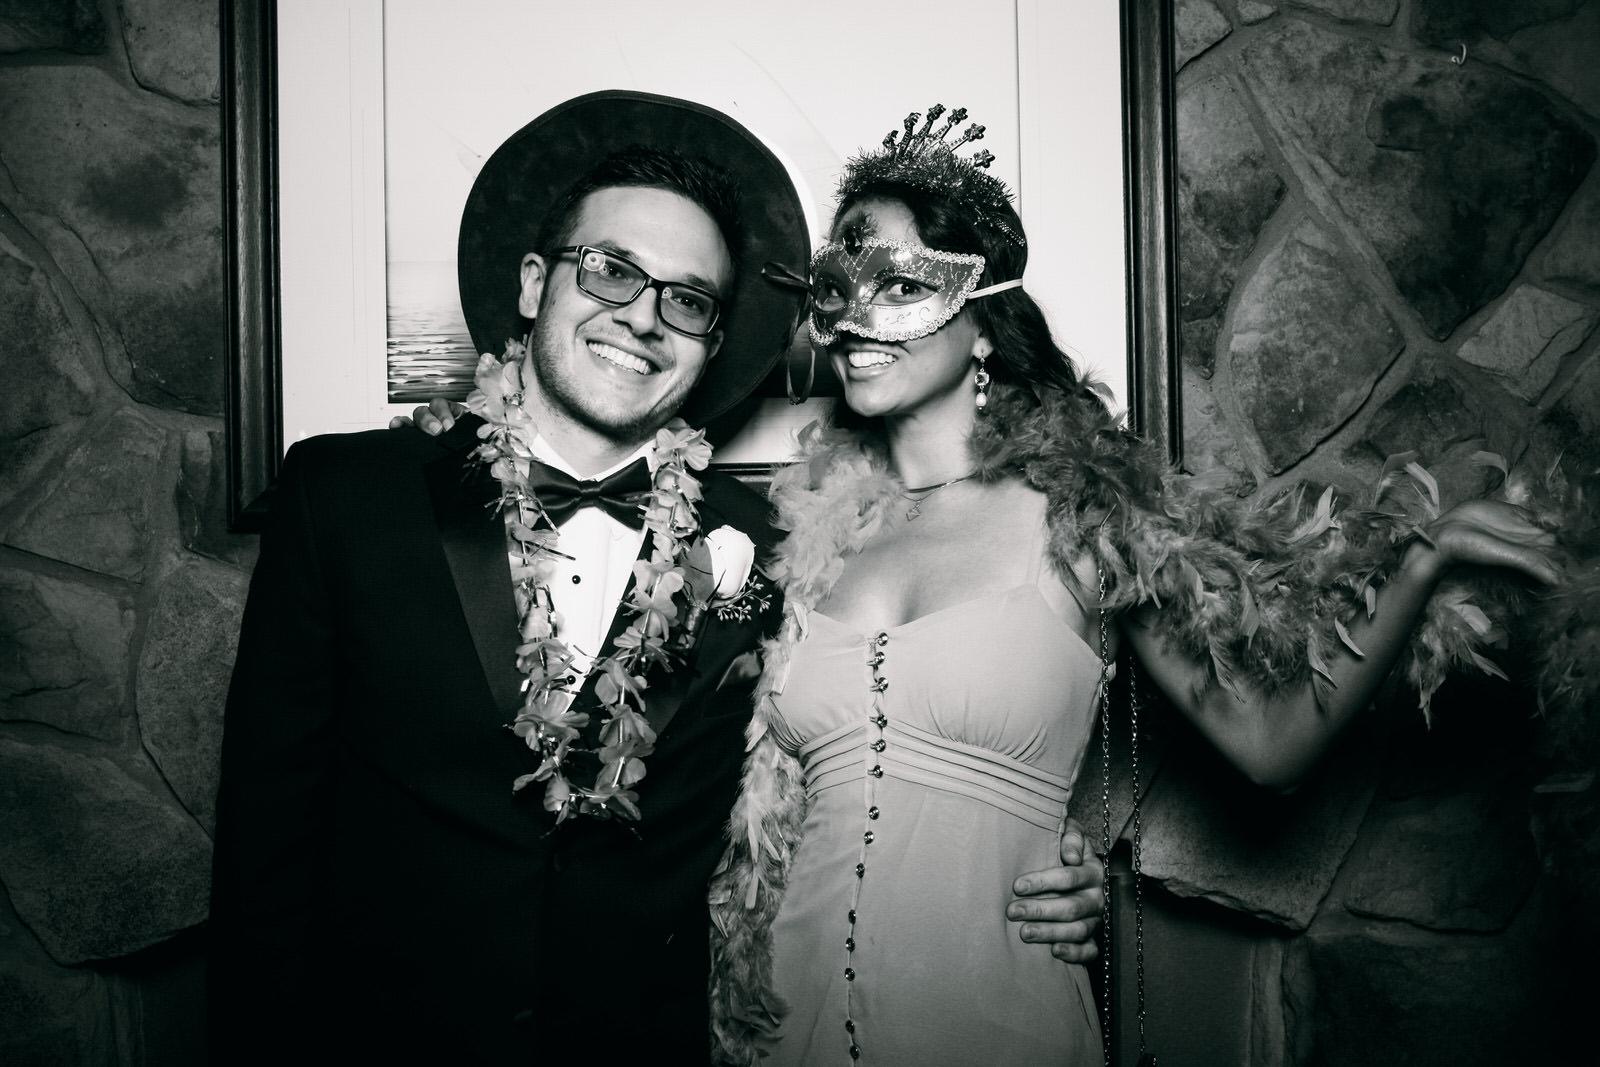 Jeanine-Sean-Wedding-Photo-Booth-1.jpg